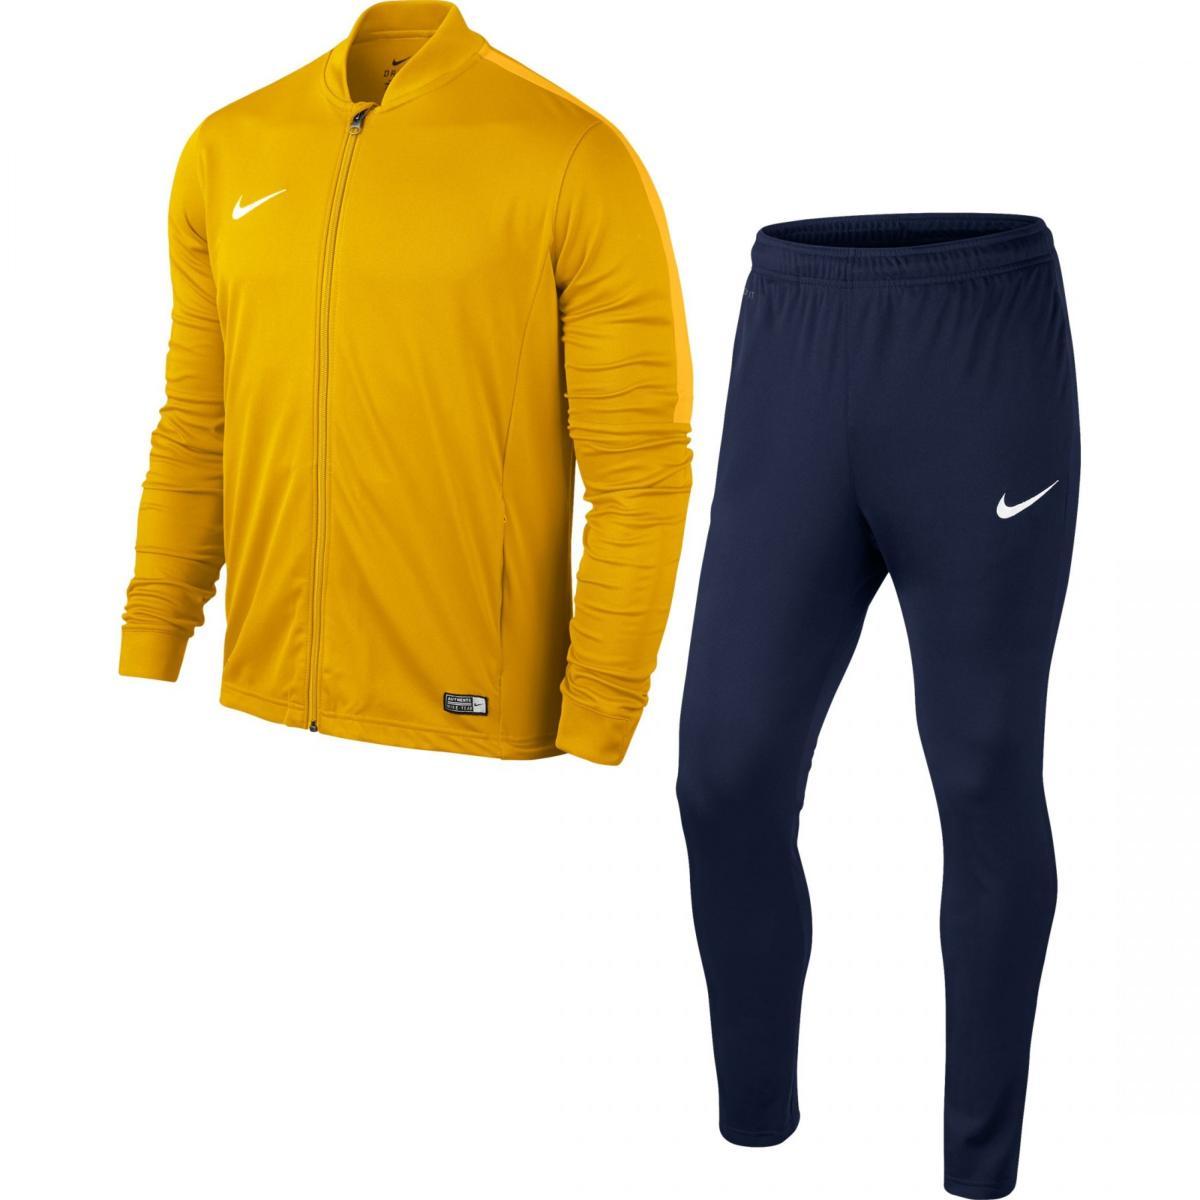 bd98dc8e55e6b ... Survêtement Nike Academy 16 Ref   808760 (enfant) ...